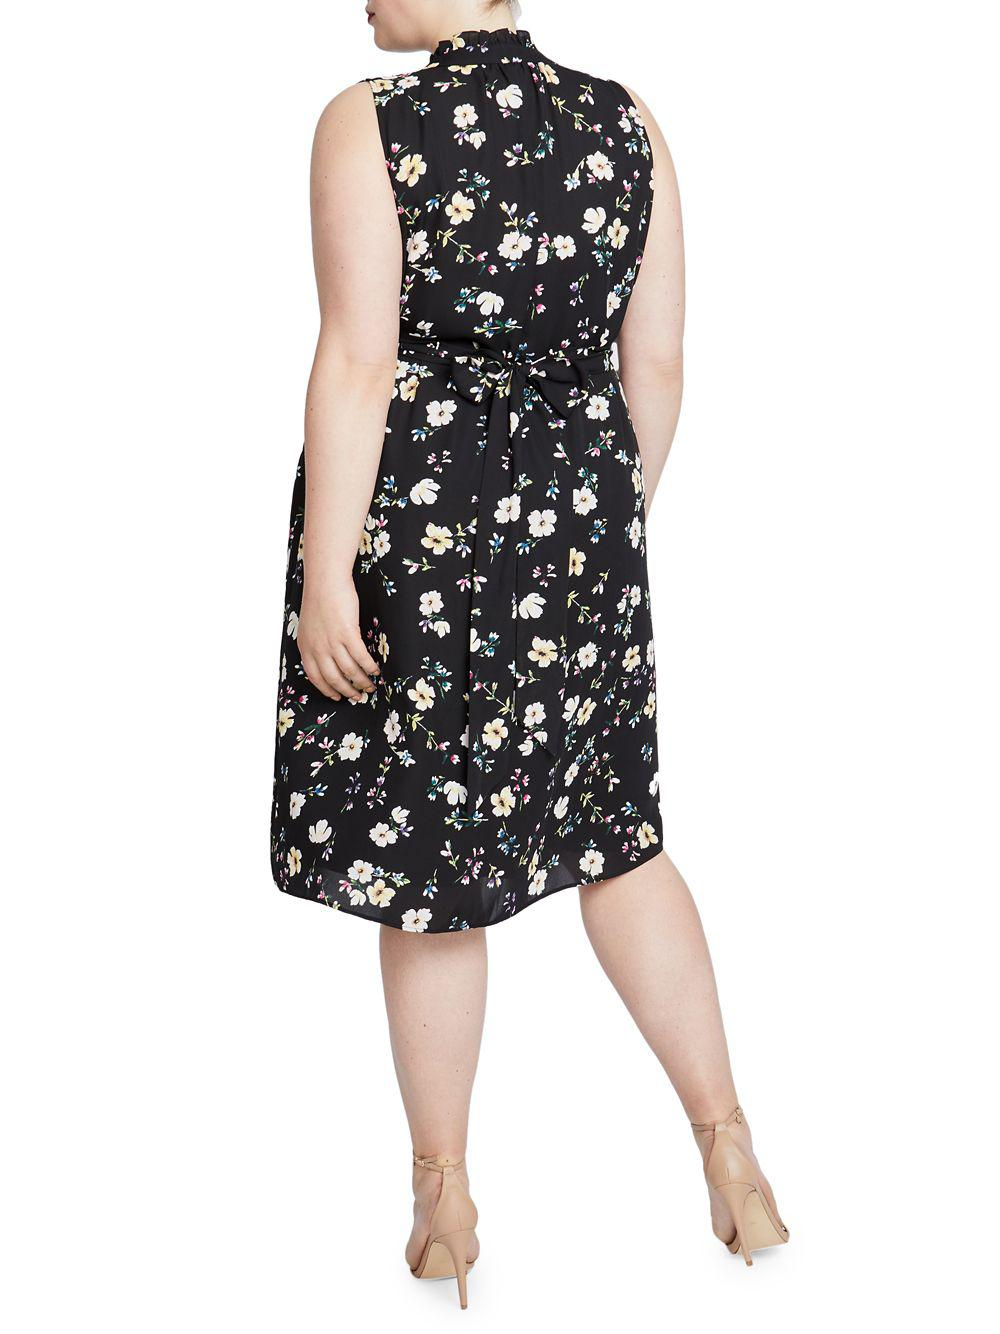 e9ef3ba6977 Lyst - Rachel Rachel Roy Brit Dress in Black - Save 40.84507042253521%